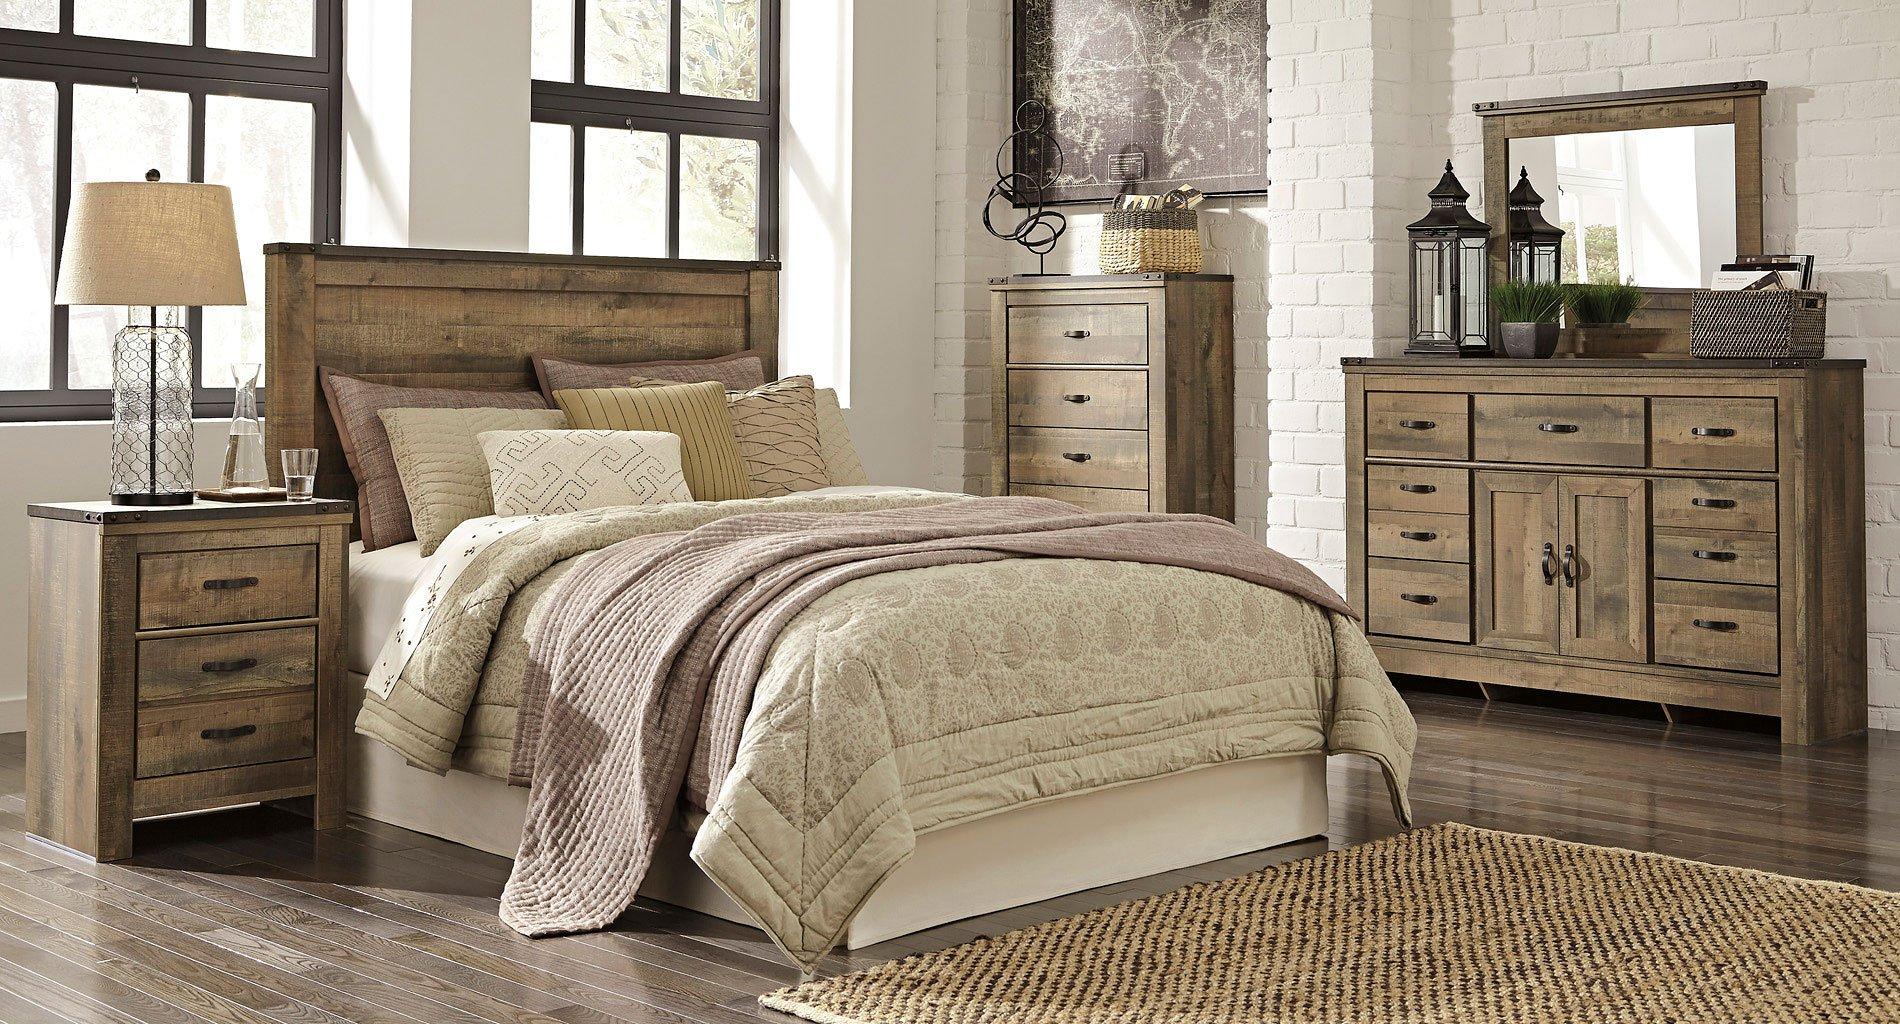 Trinell Headboard Bedroom Set Signature Design 2 Reviews